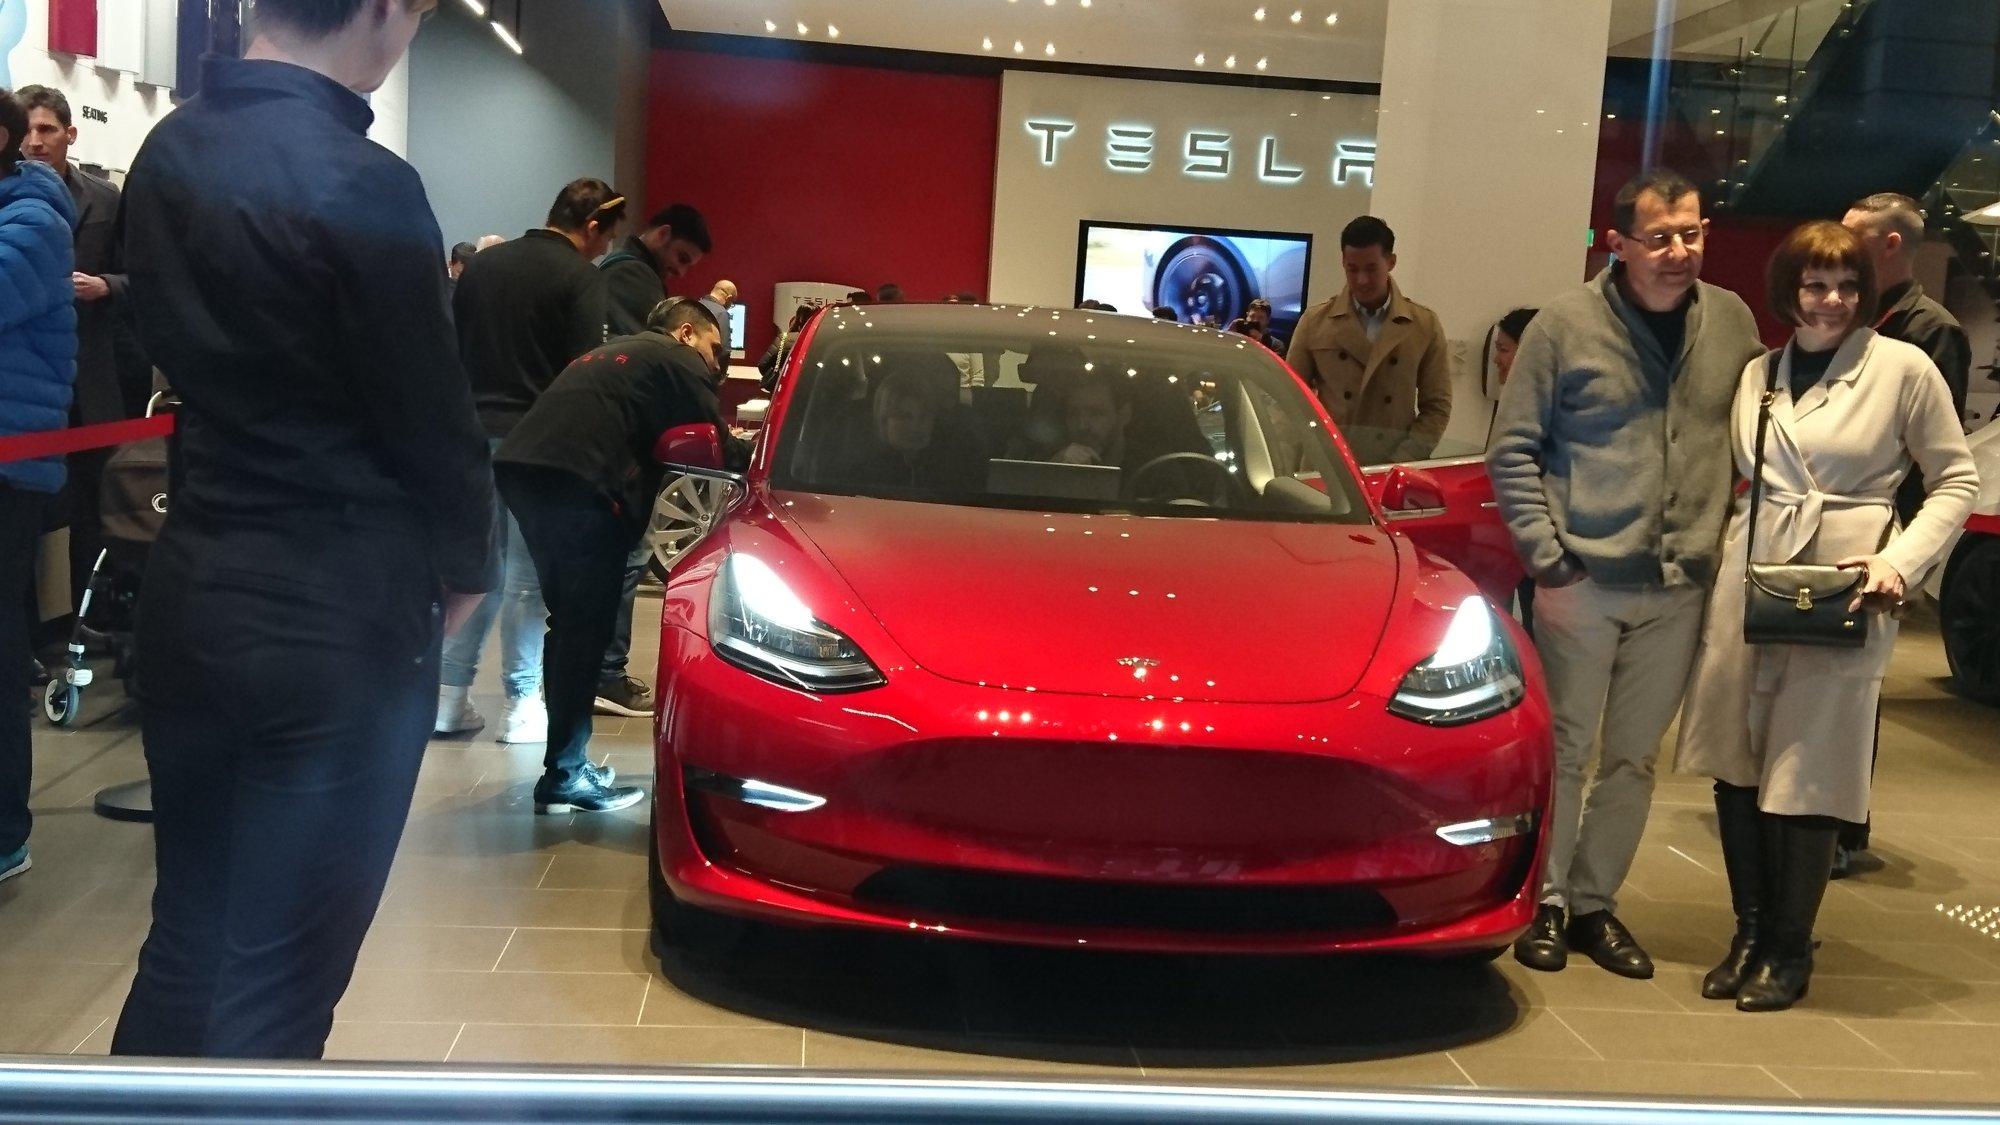 Model 3 at Martin Place 2.JPG